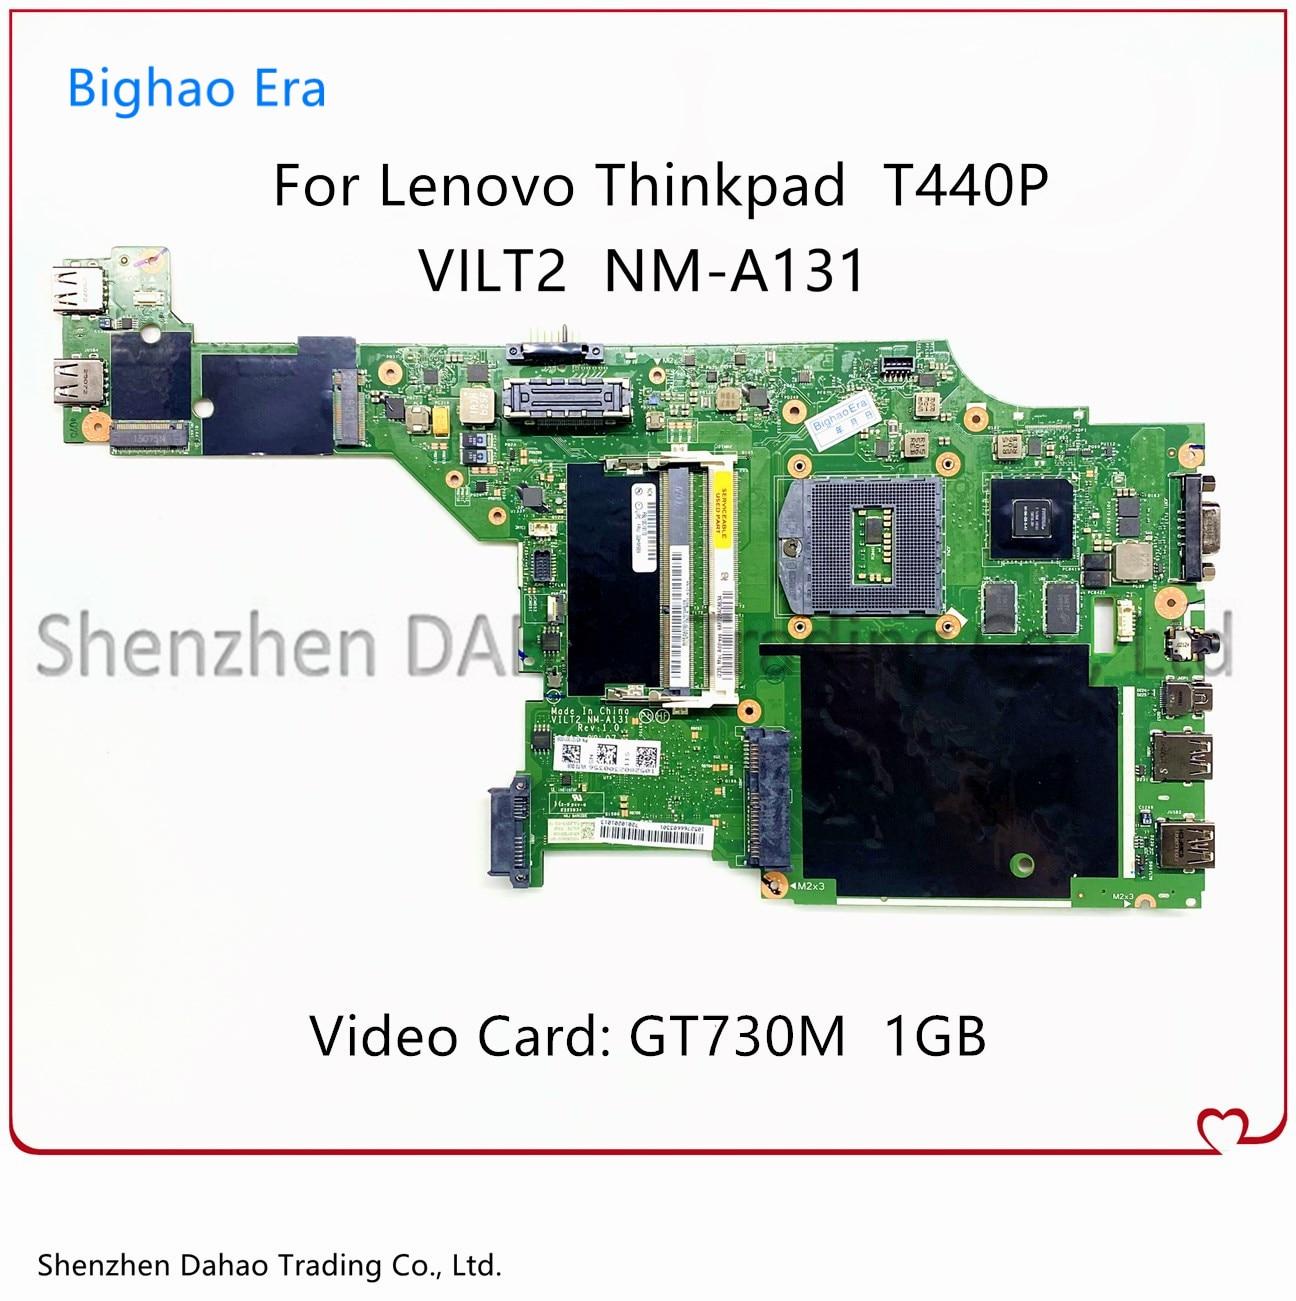 VILT2 NM-A131 لينوفو ثينك باد T440P اللوحة المحمول مع GT730M 1GB-GPU 100% العمل FRU 00HM981 00HM983 04X4086 00HM985